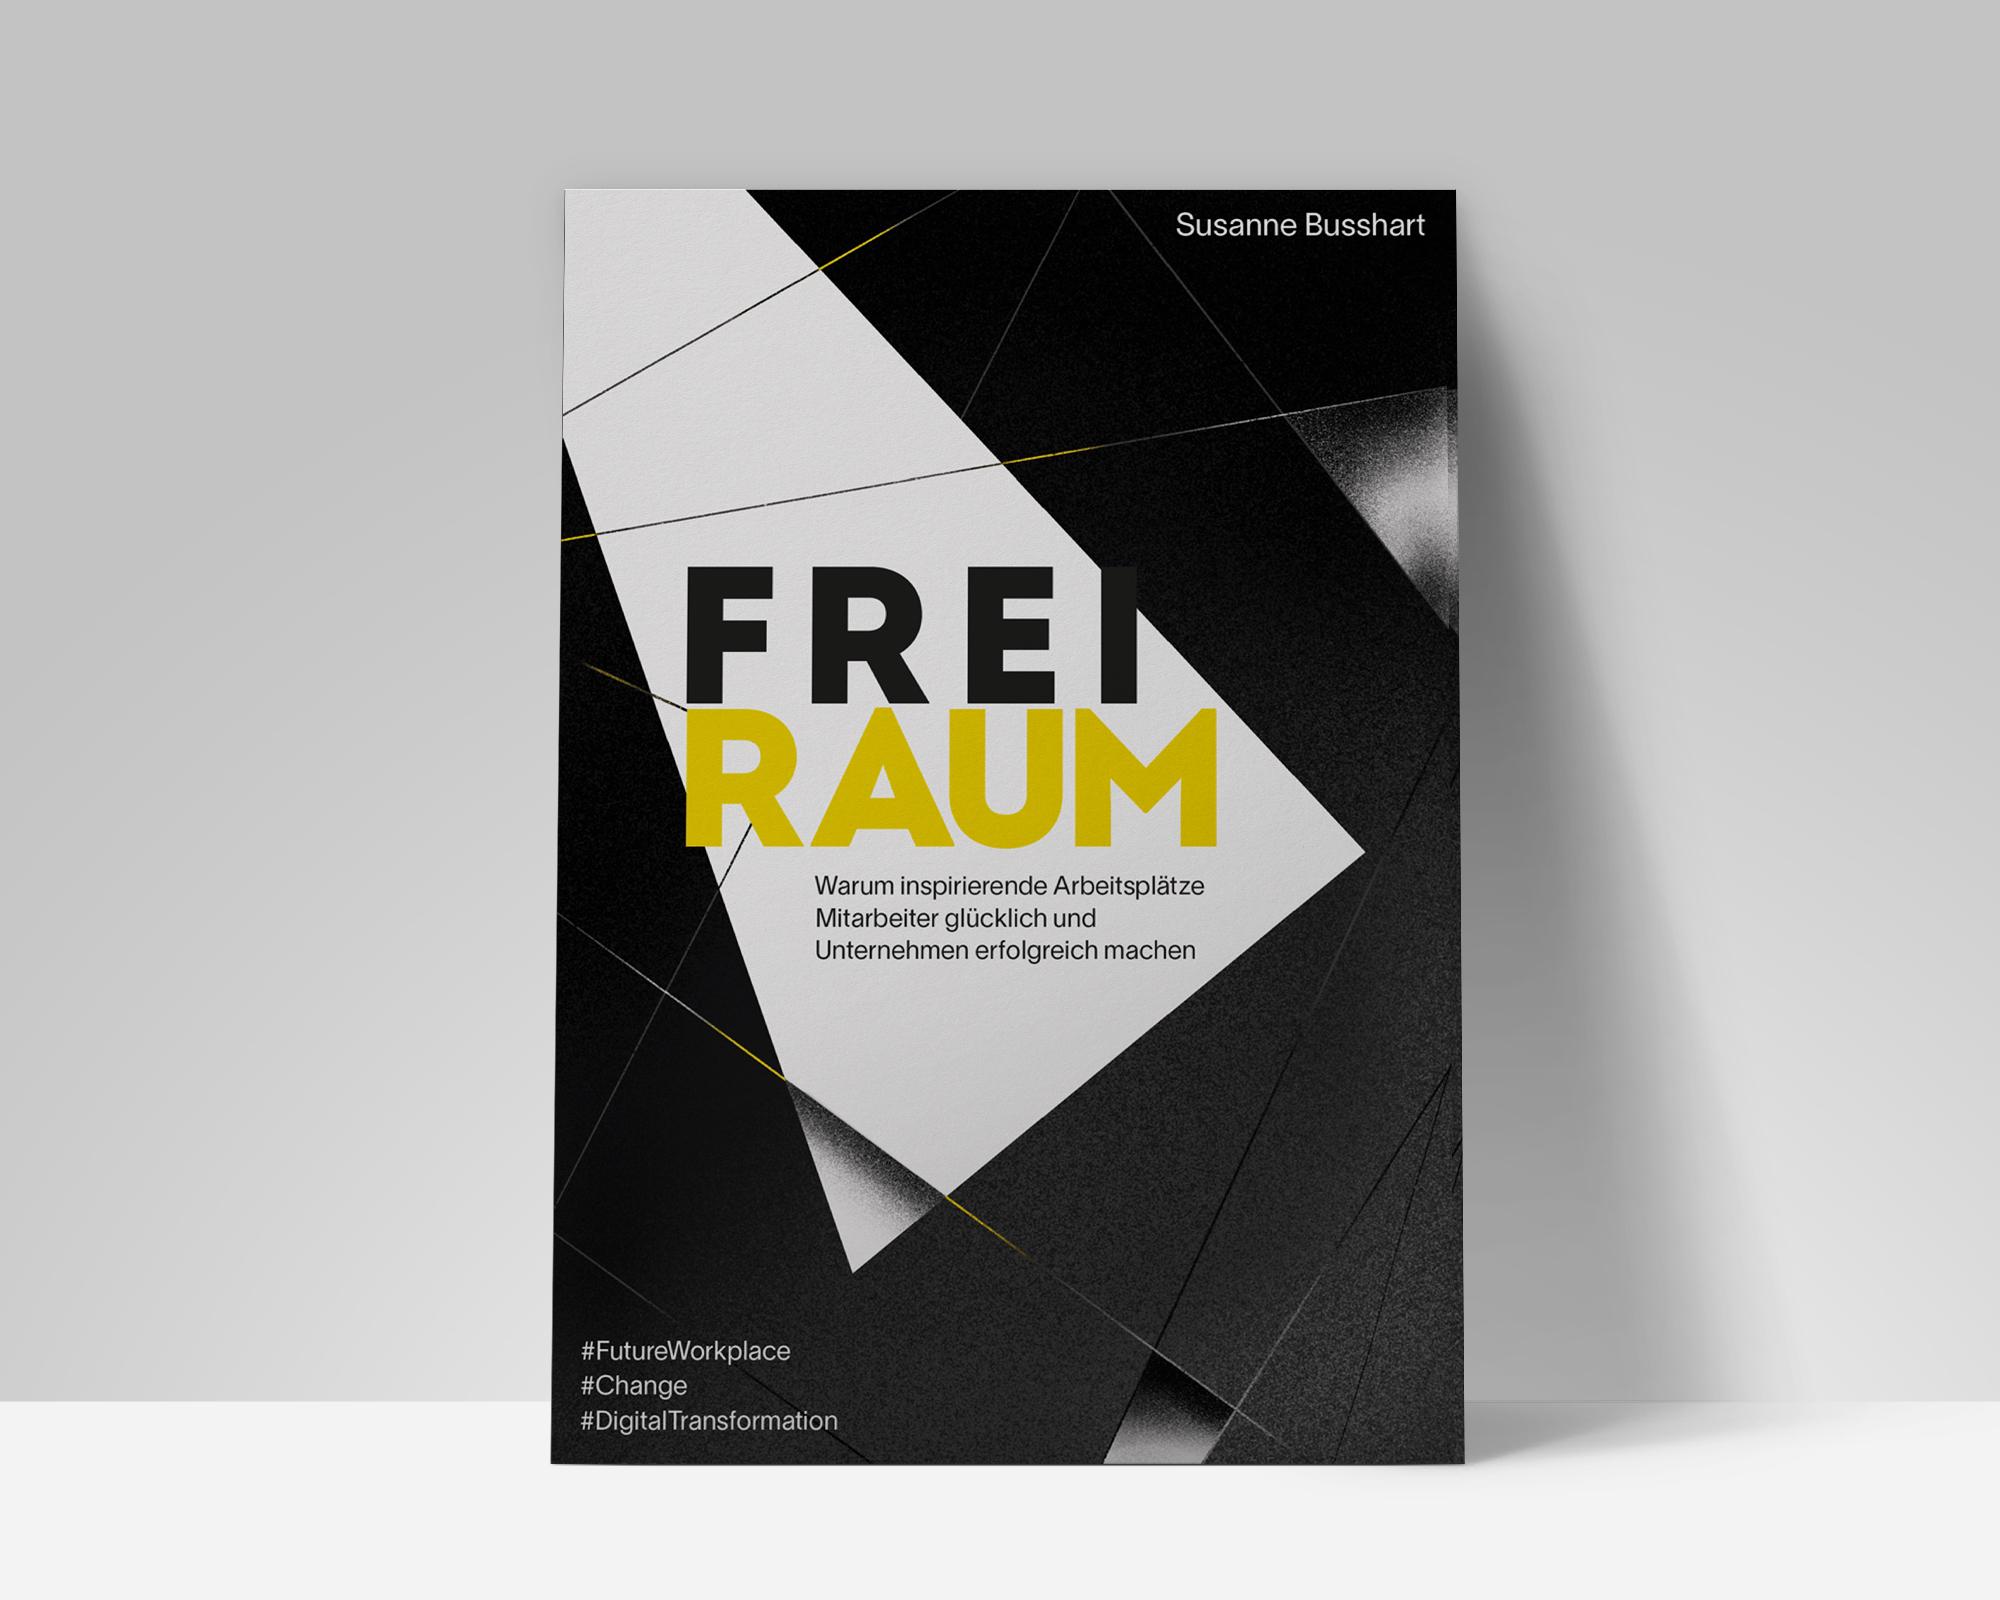 FreiRaum by Susanne Busshart